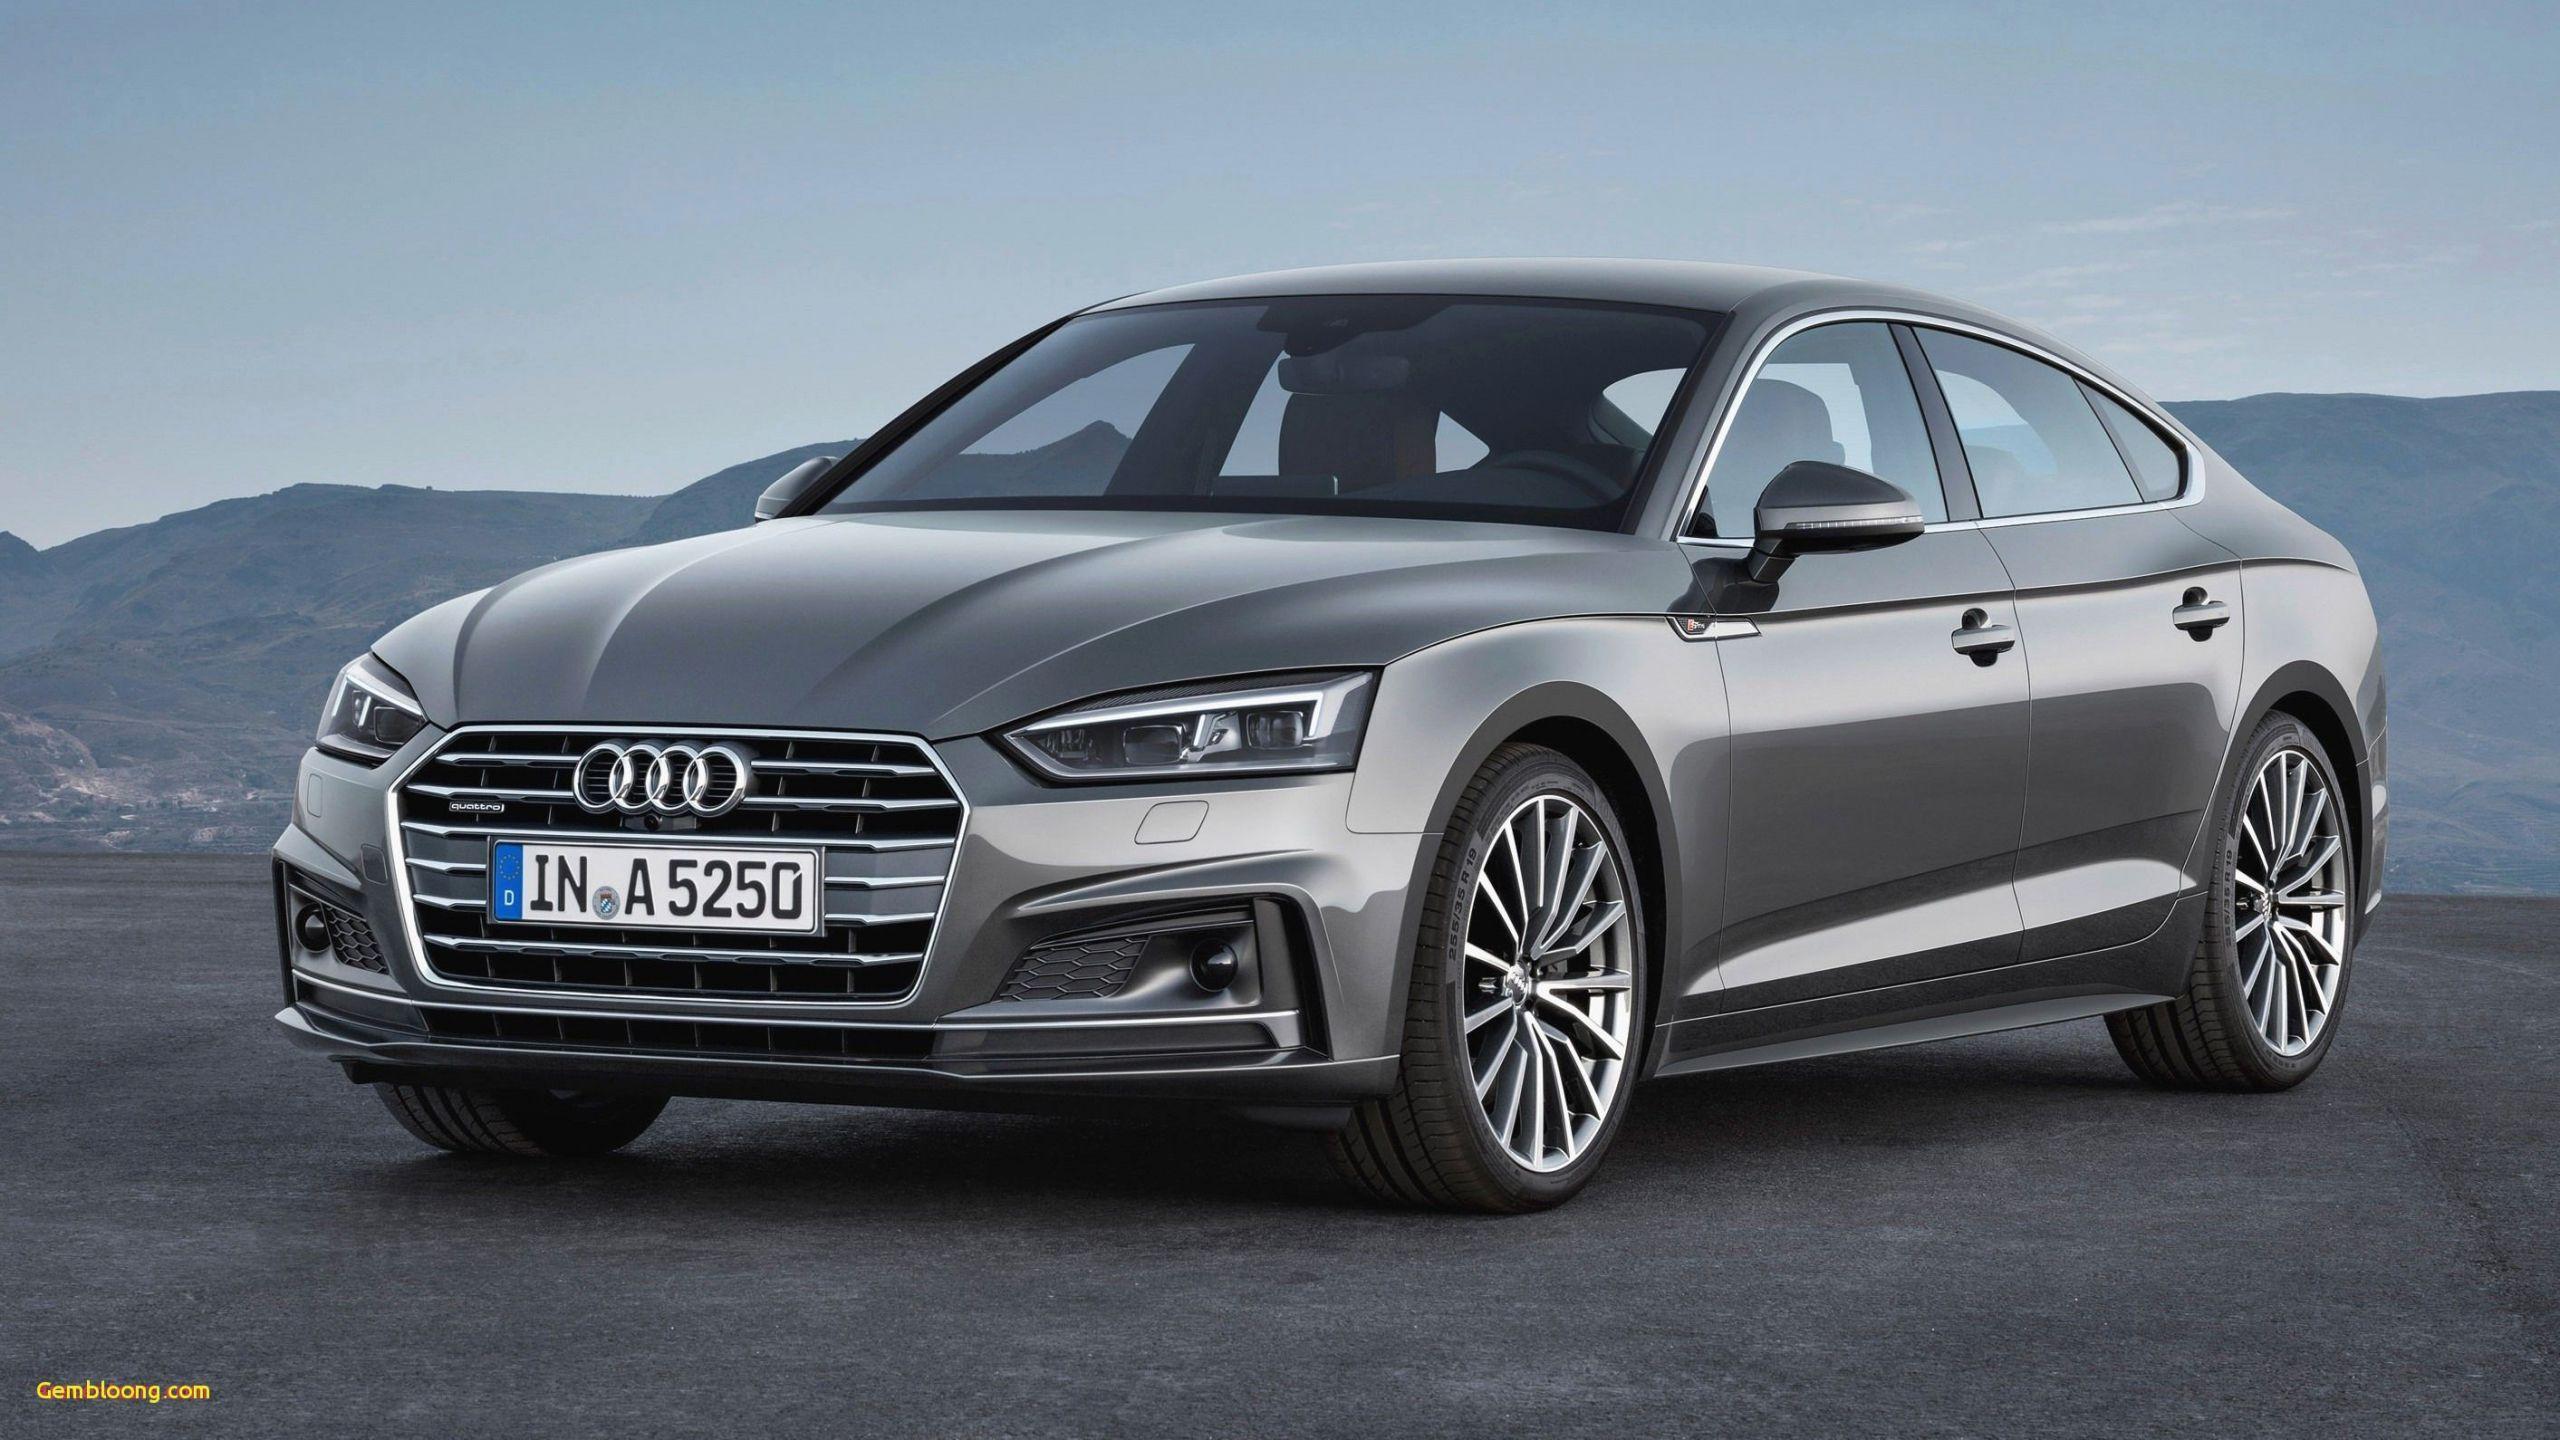 Audi G Tron 2020 Spy Shoot Check More At Http Car Newmodels Net Audi G Tron 2020 Di 2020 Mobil Kendaraan Audi